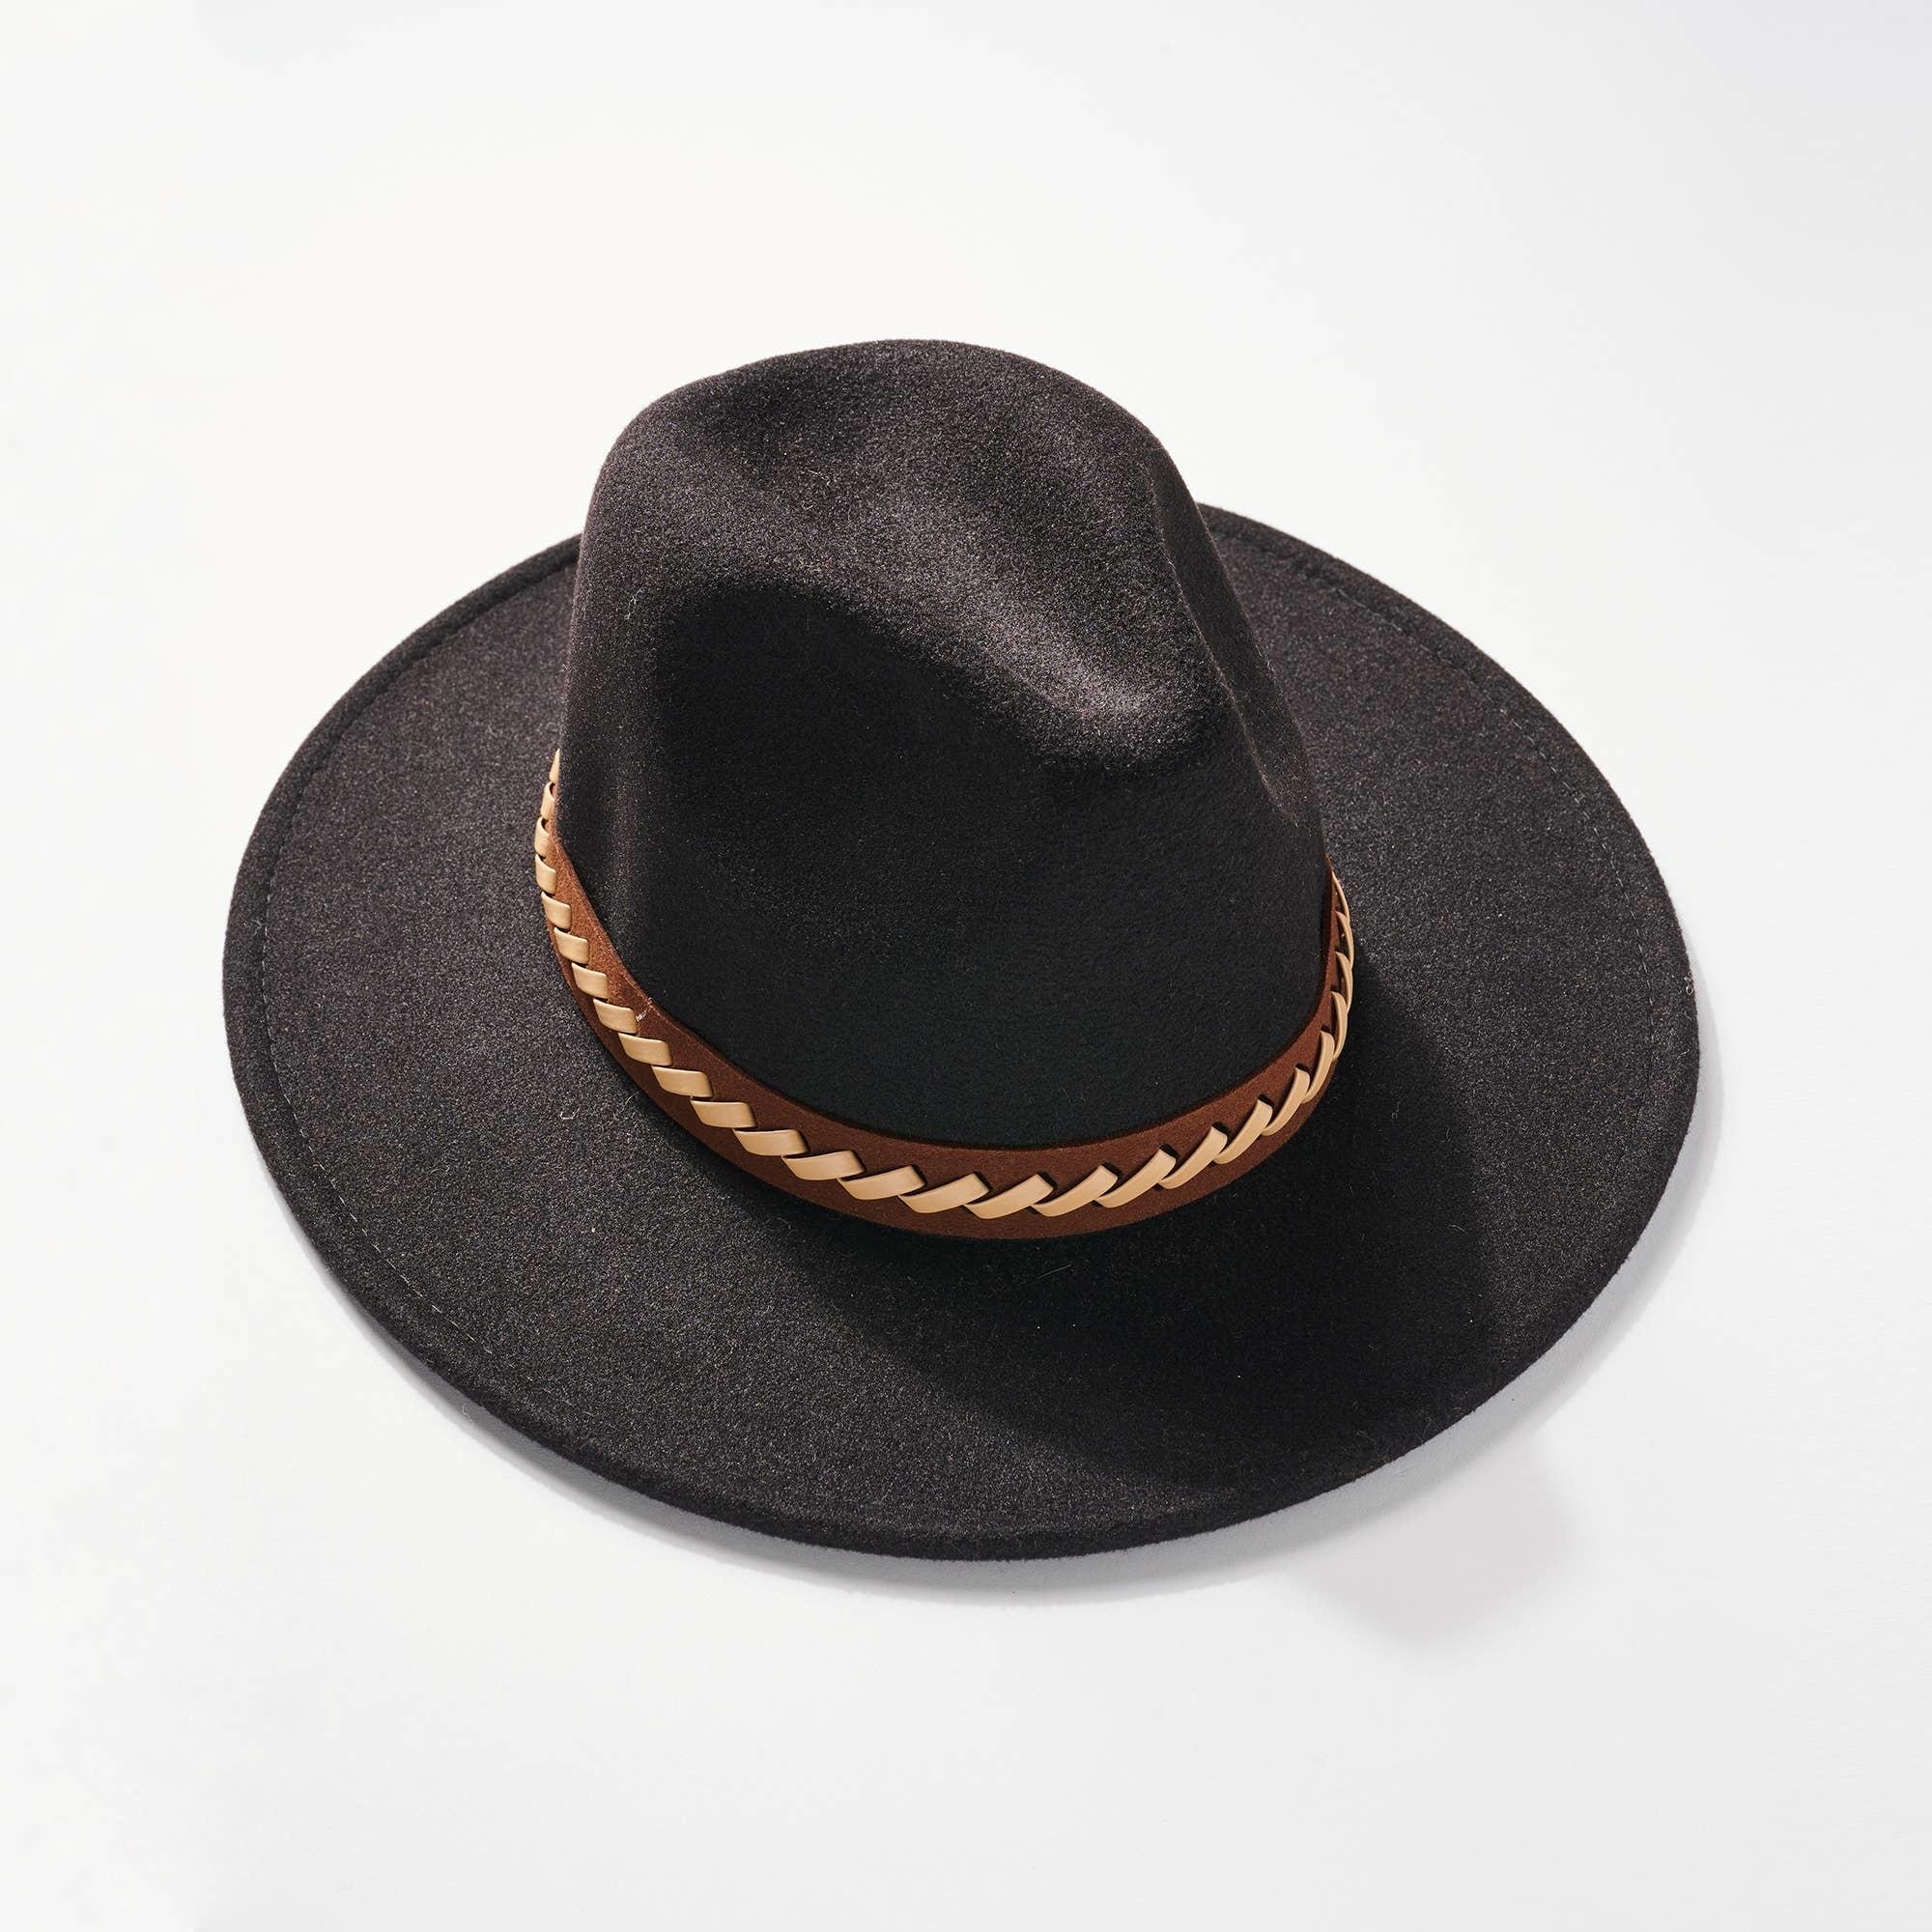 AVENUE ZOE PANAMA HAT BLACK WITH BRAIDED STRAP